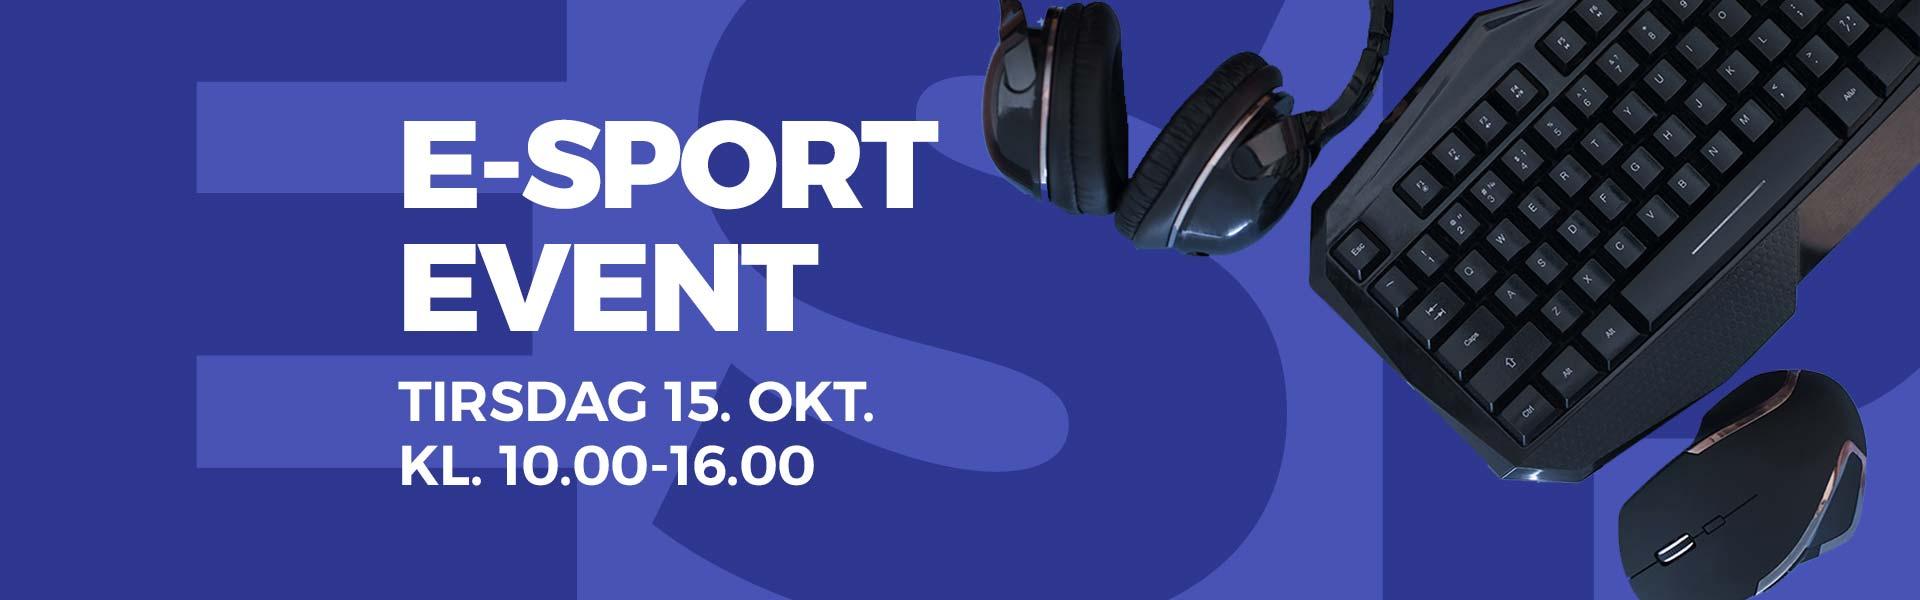 Oplev Tarup Centers e-sport event tirsdag d. 15 oktober 2019